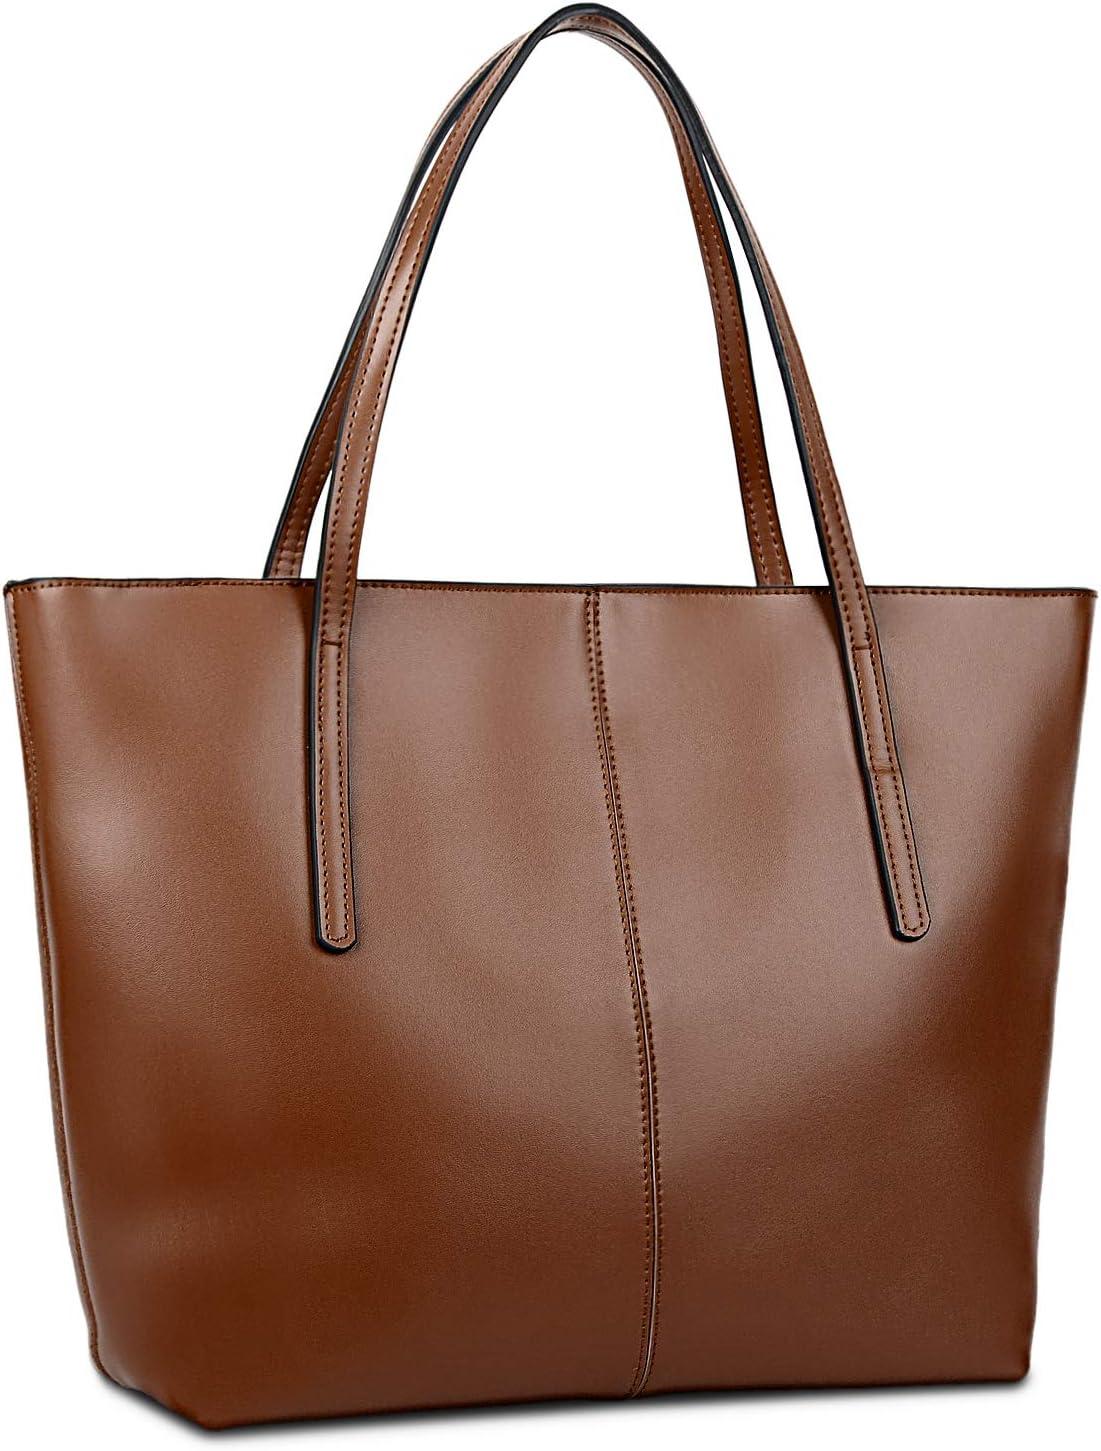 Gywon Womens Genuine Leather Tote Handbag Purse Shoulder Bag for Women 13 Inch Laptop Holder